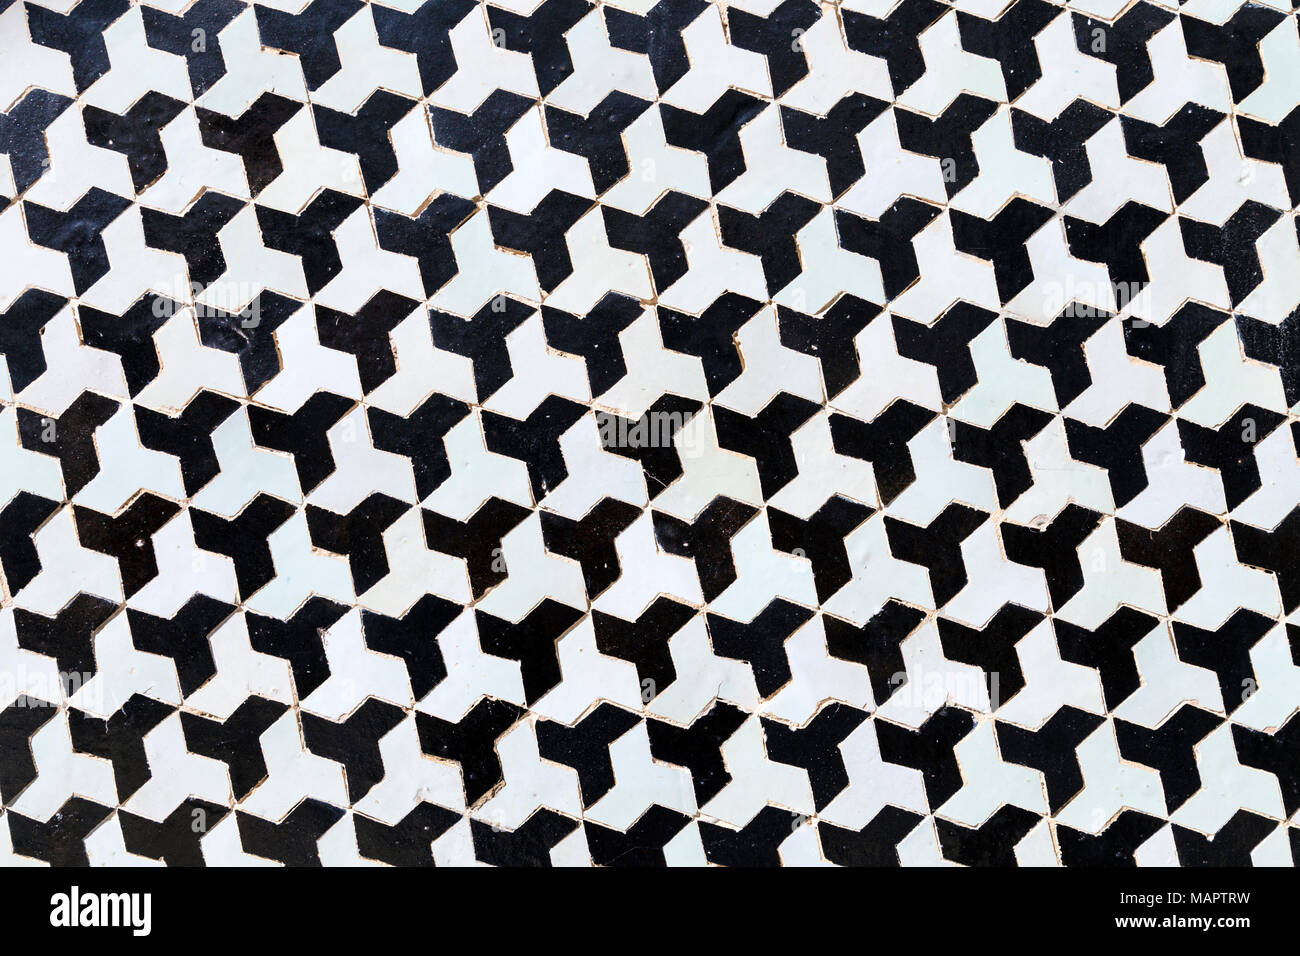 Bianco e nero marocchino geometrica a mosaico a parete palais el